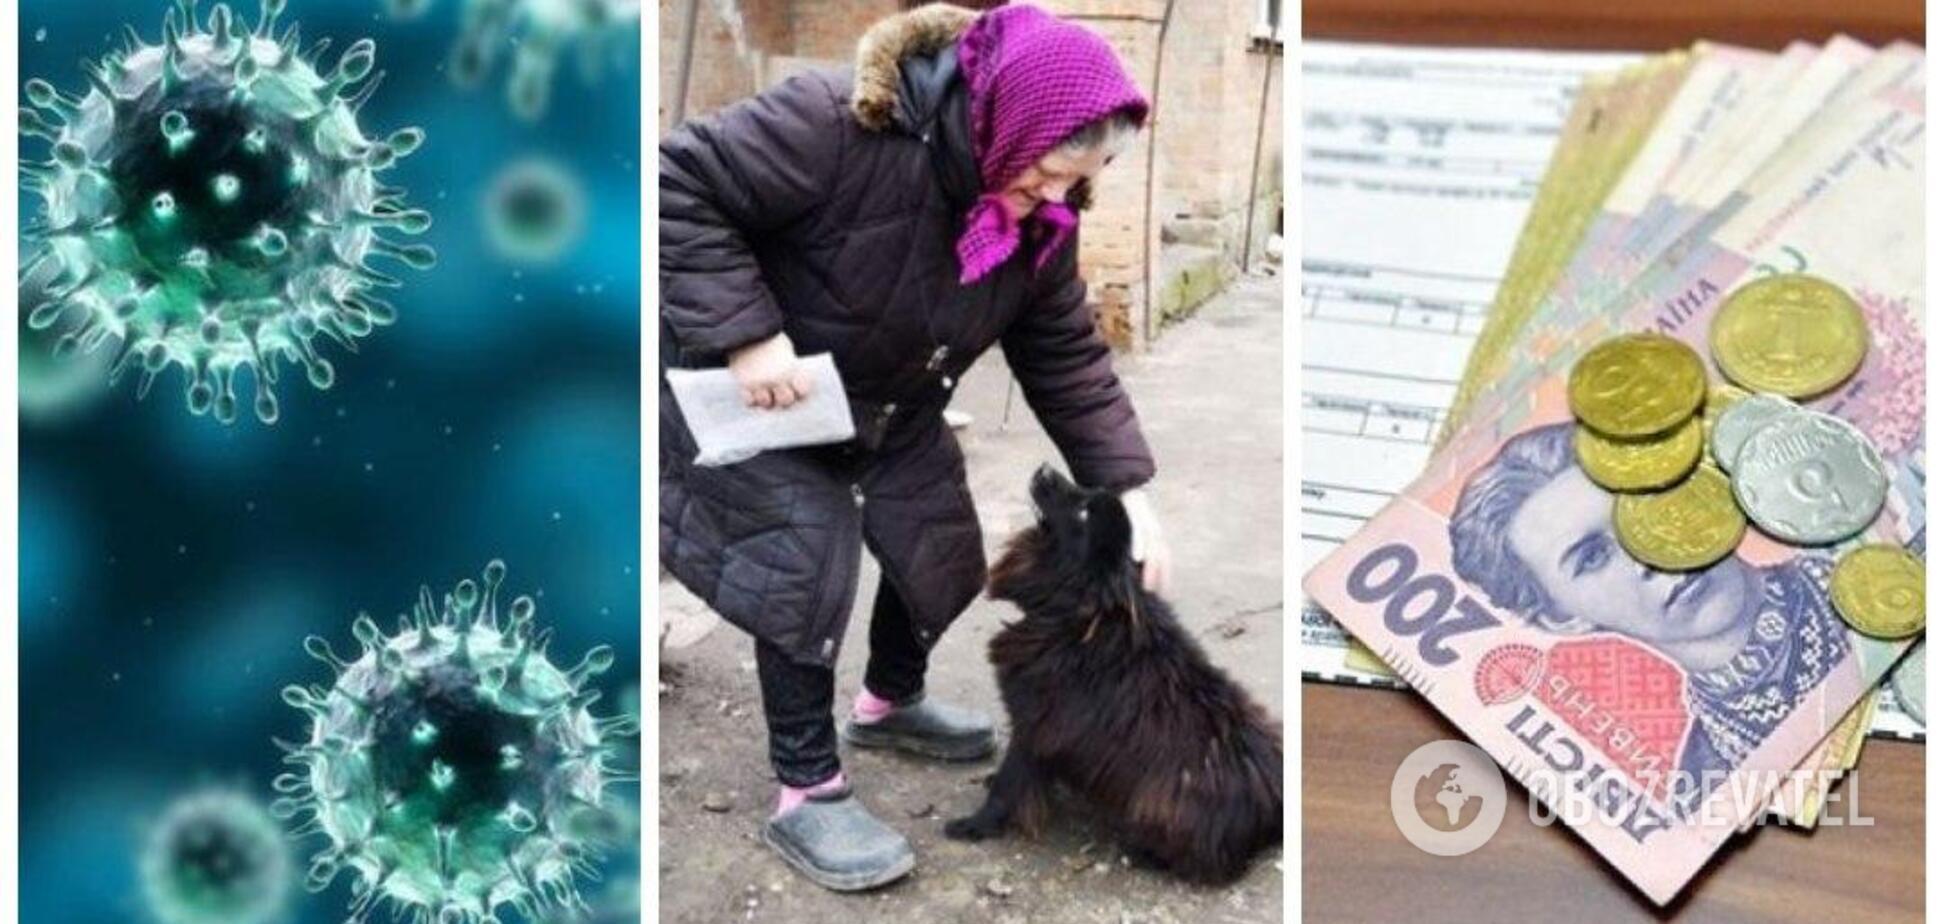 Субсидии могут урезать из-за карантина – Гончаренко